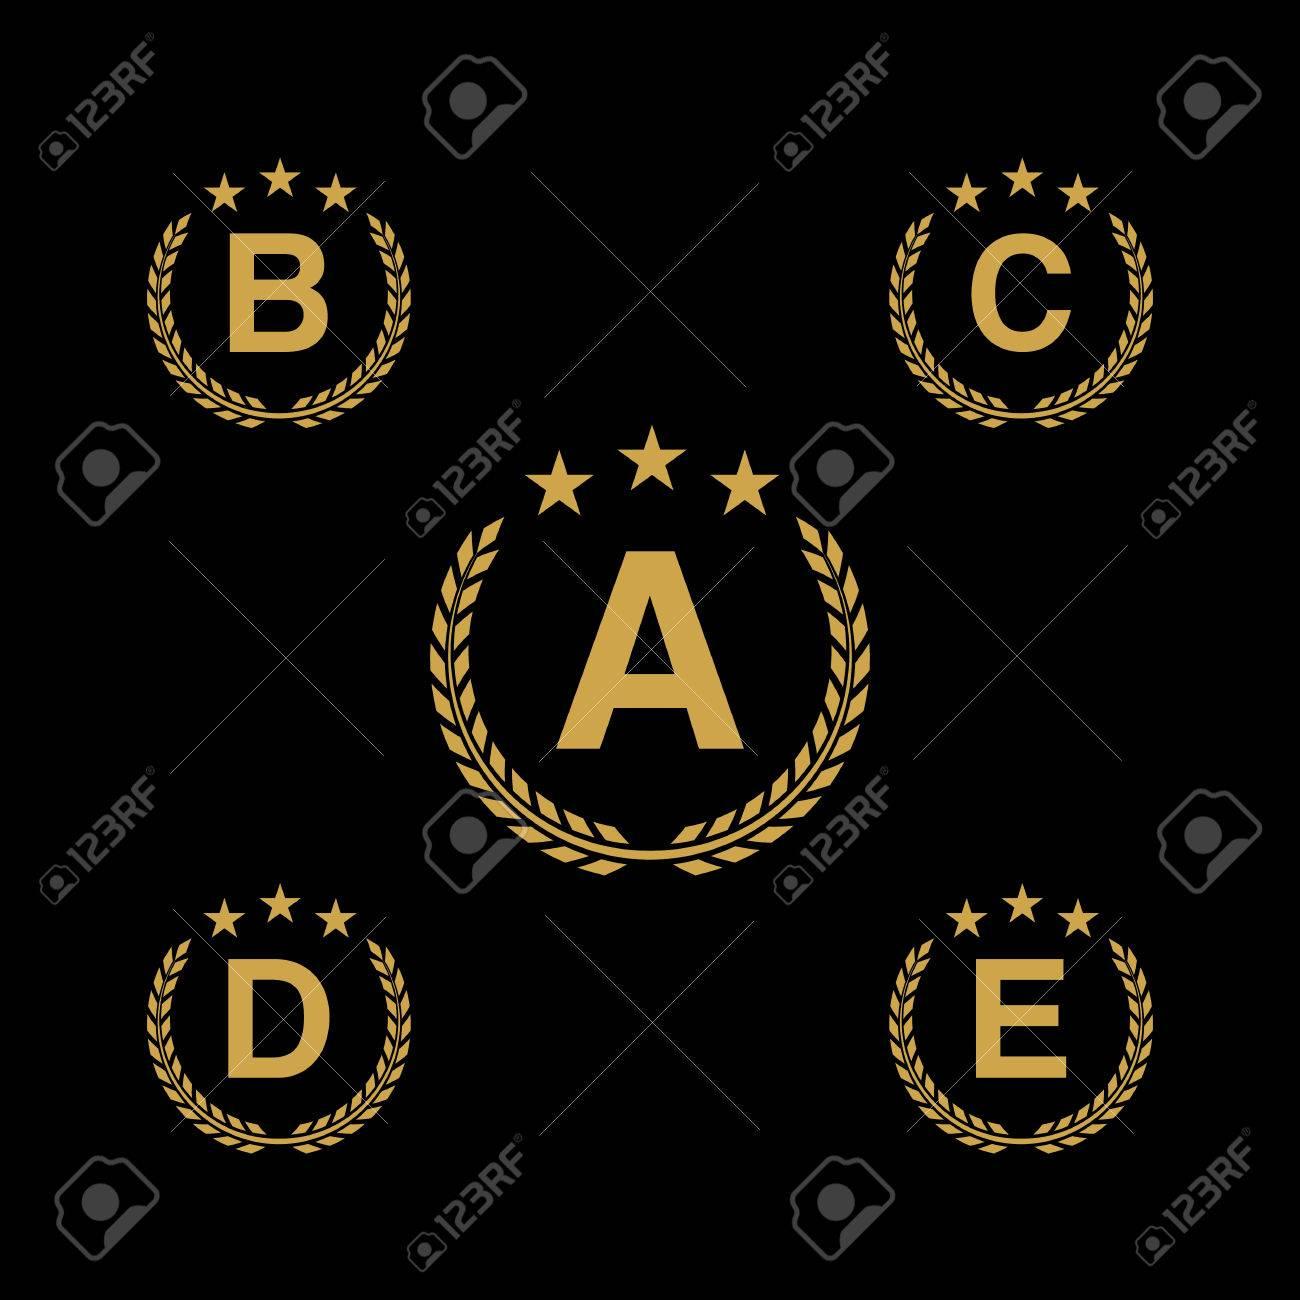 Golden star laurel wreath laurel wreath logo icon with capital laurel wreath logo icon with capital alphabet letters design template spiritdancerdesigns Choice Image